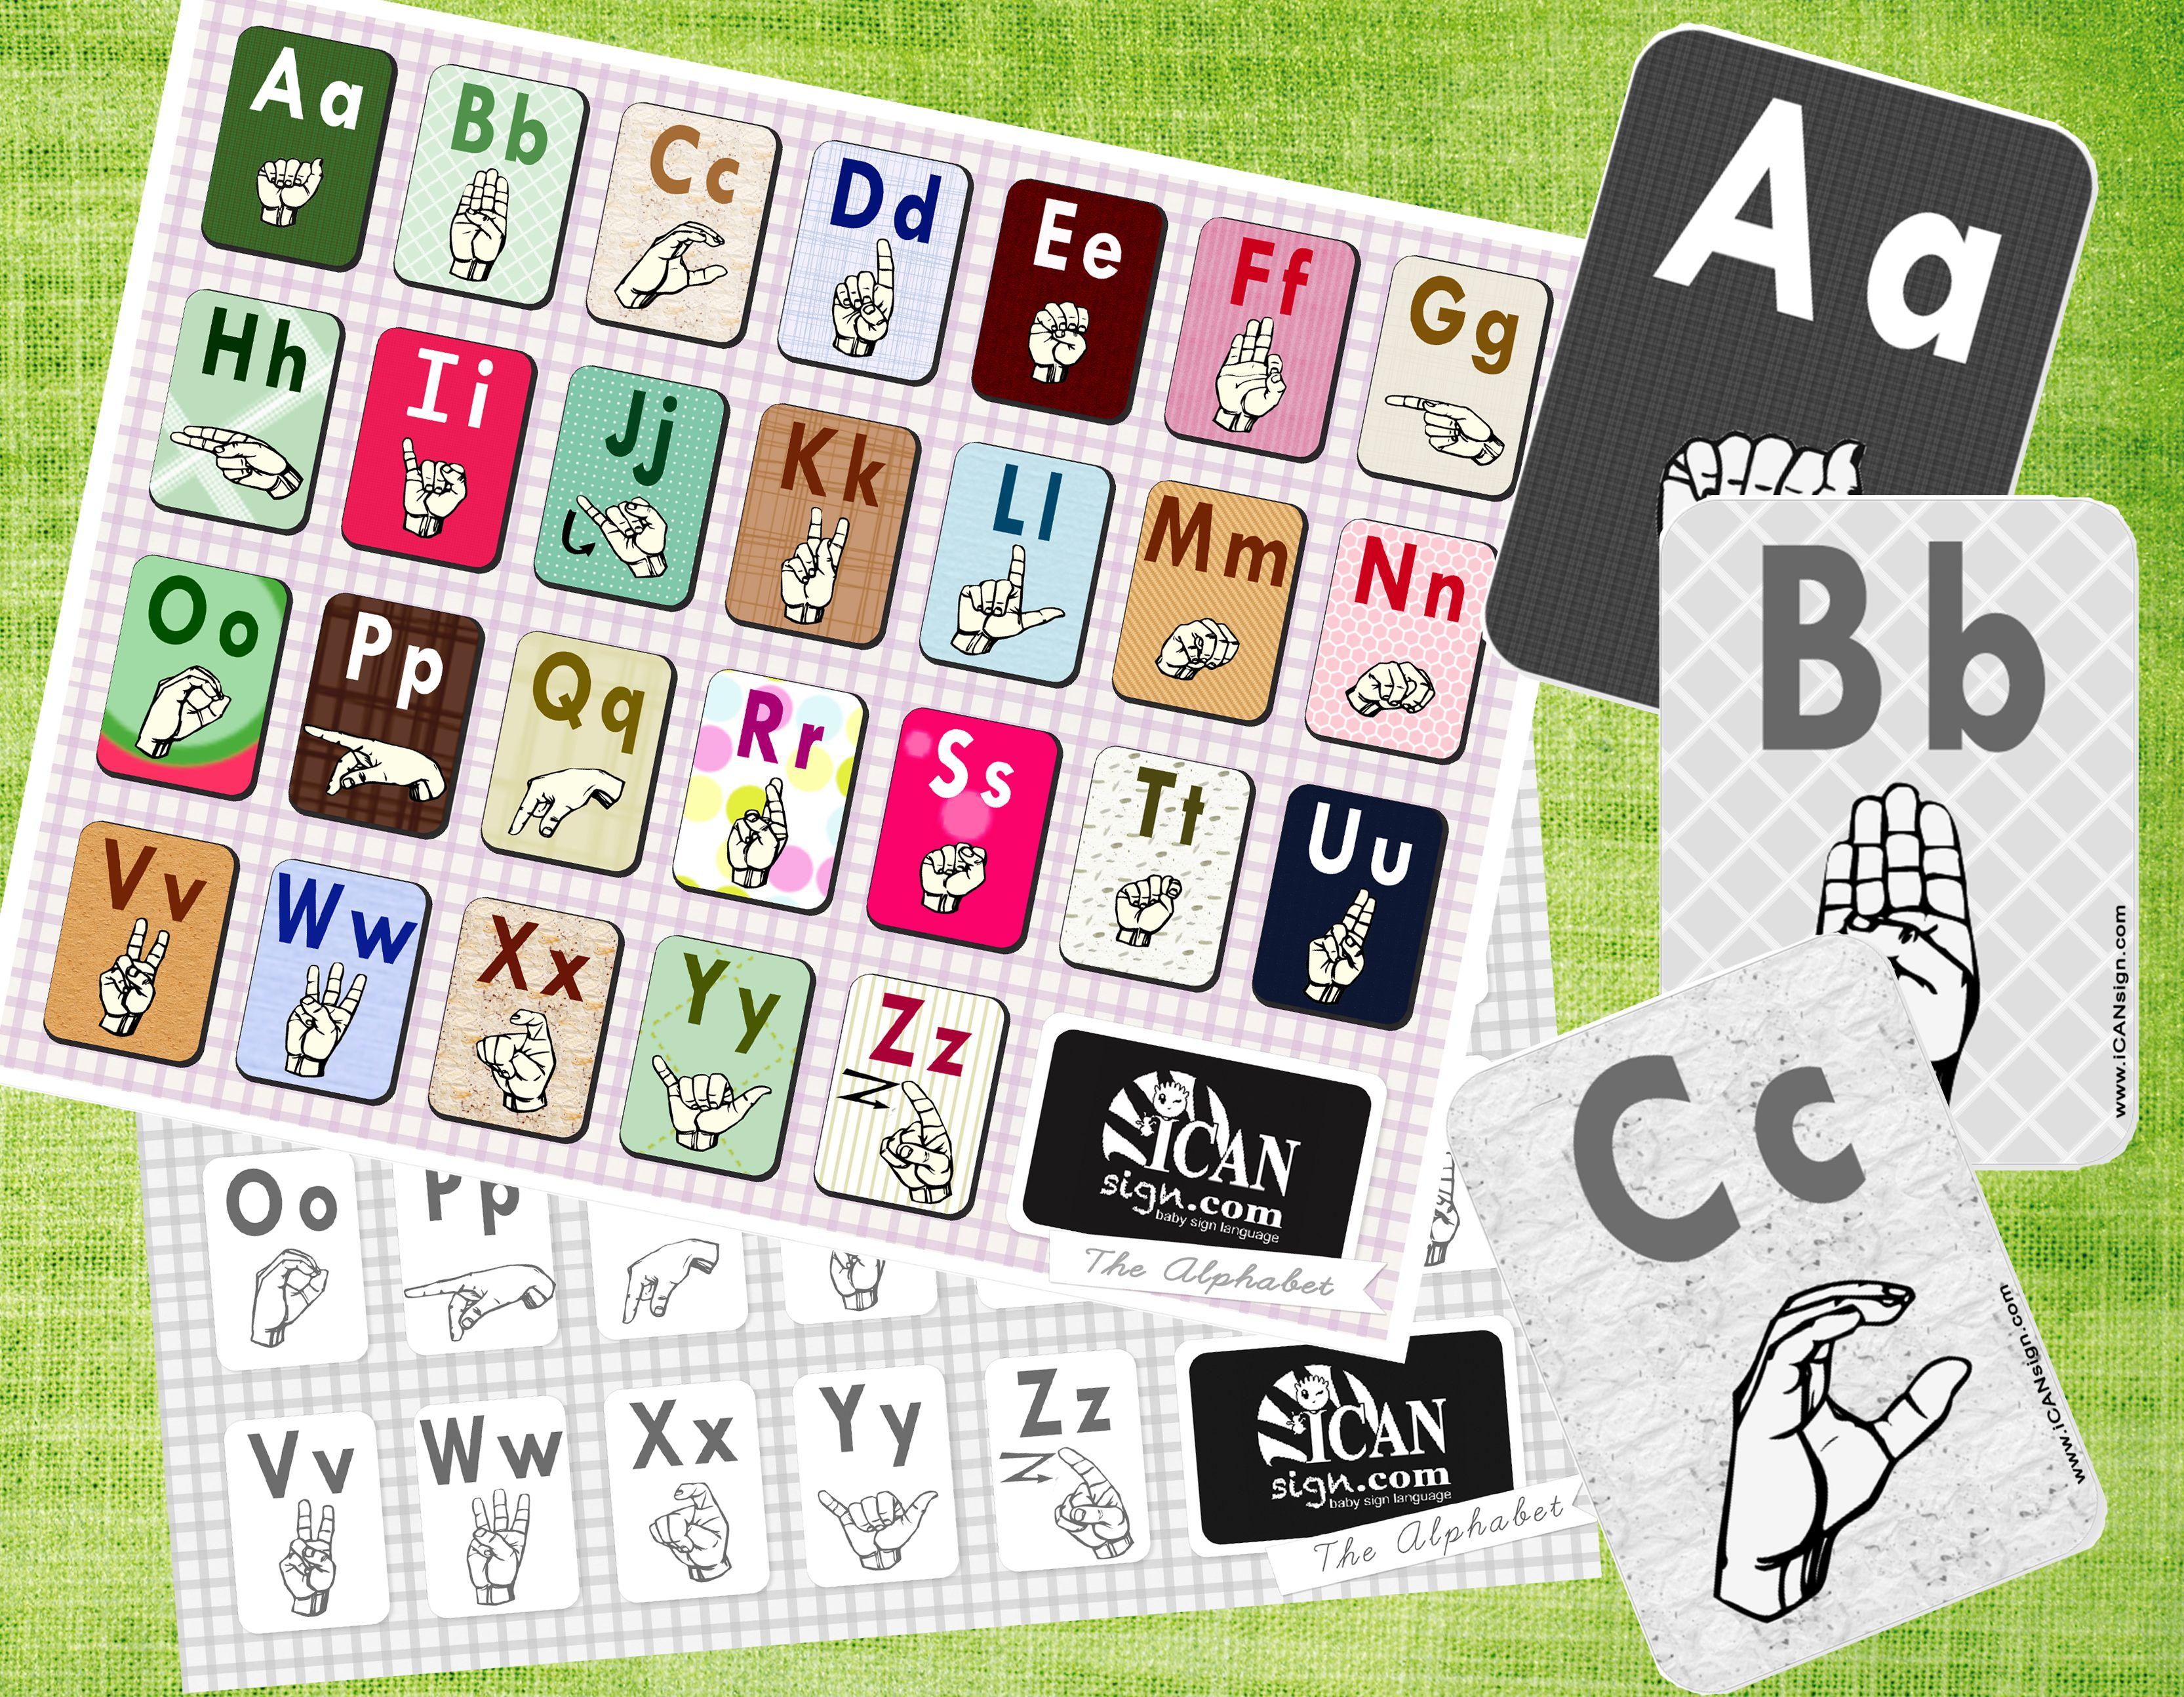 Asl Alphabet Chart And Asl Alphabet Flashcards The Kids